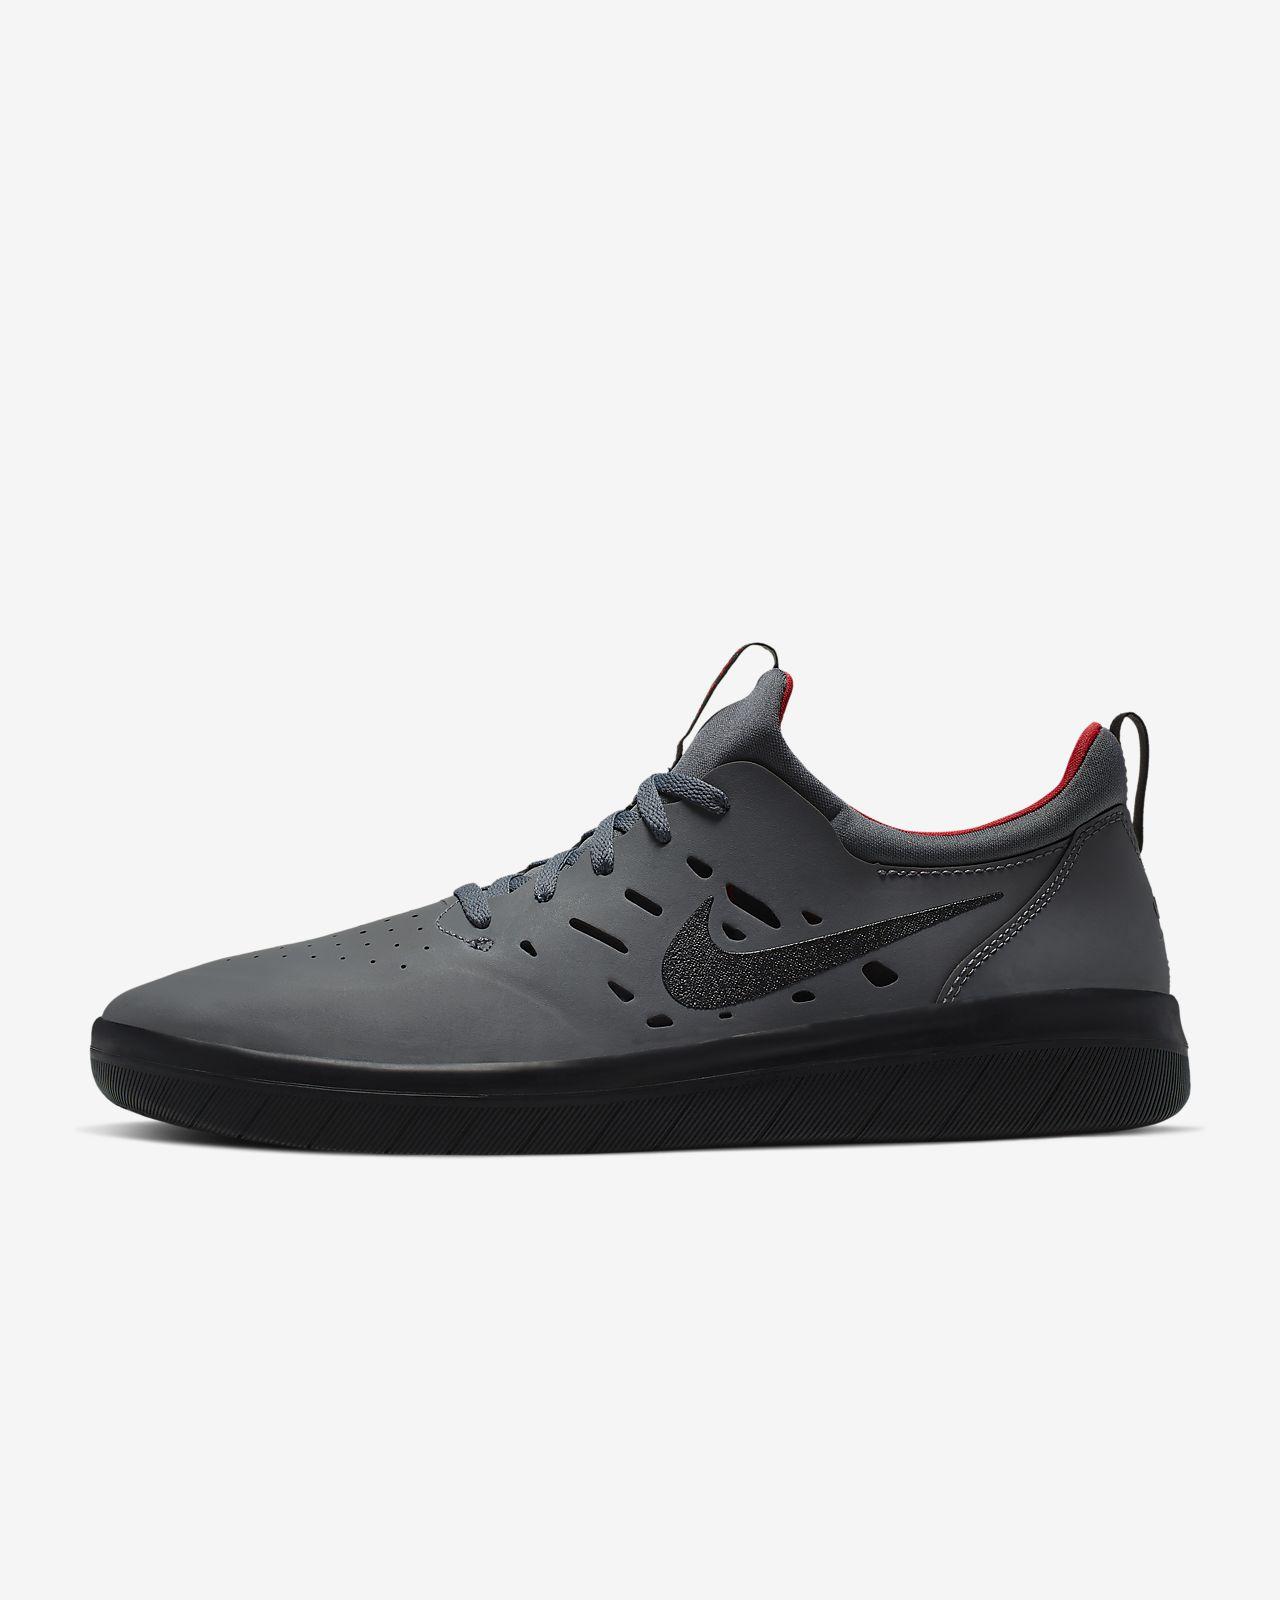 Nike SB Nyjah Free Black & White Skate Shoes